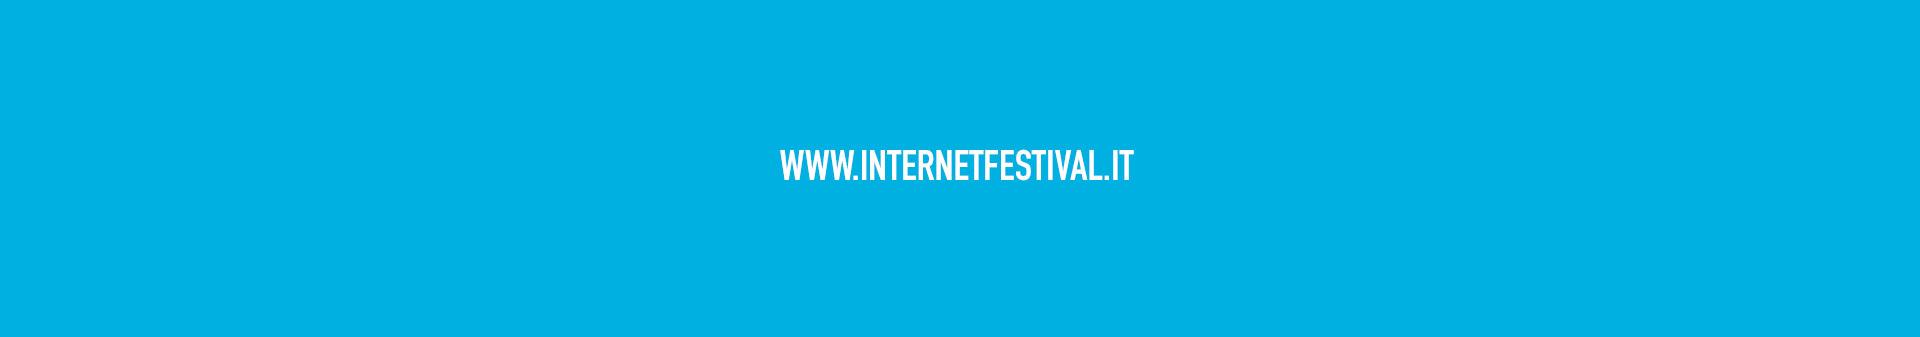 Internet-Festival-site-link1